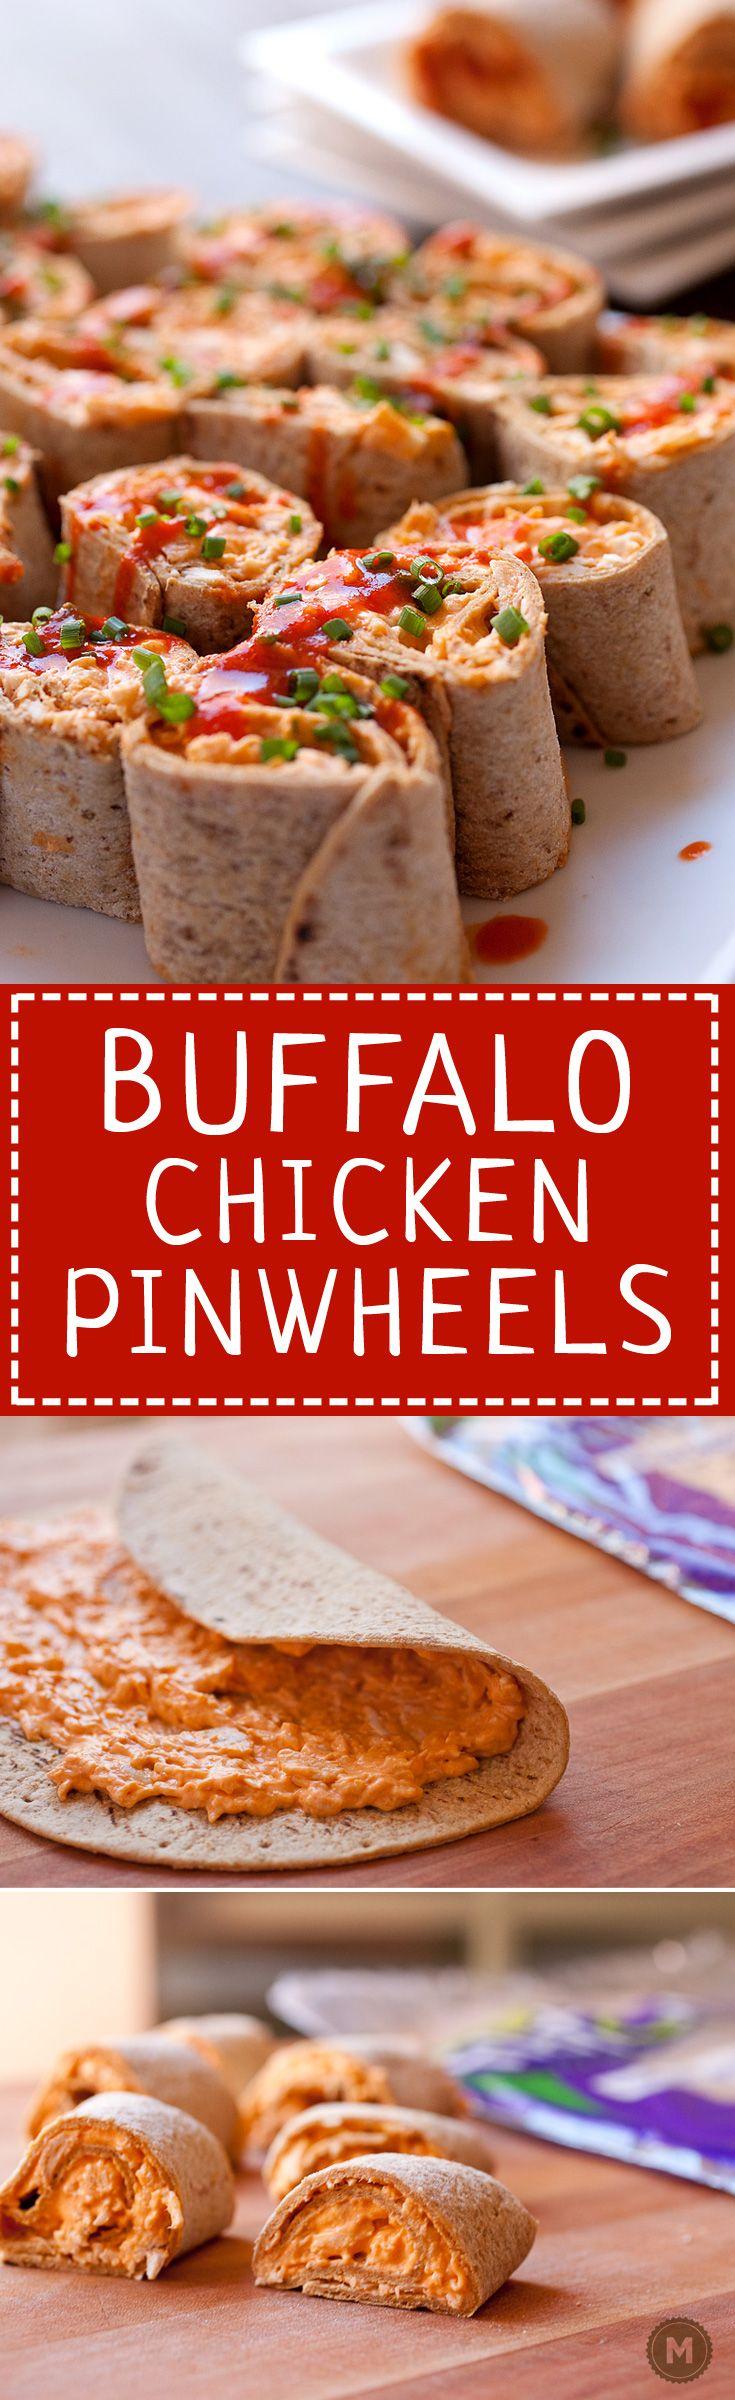 Best 25+ Chicken pinwheels ideas on Pinterest | Buffalo ...